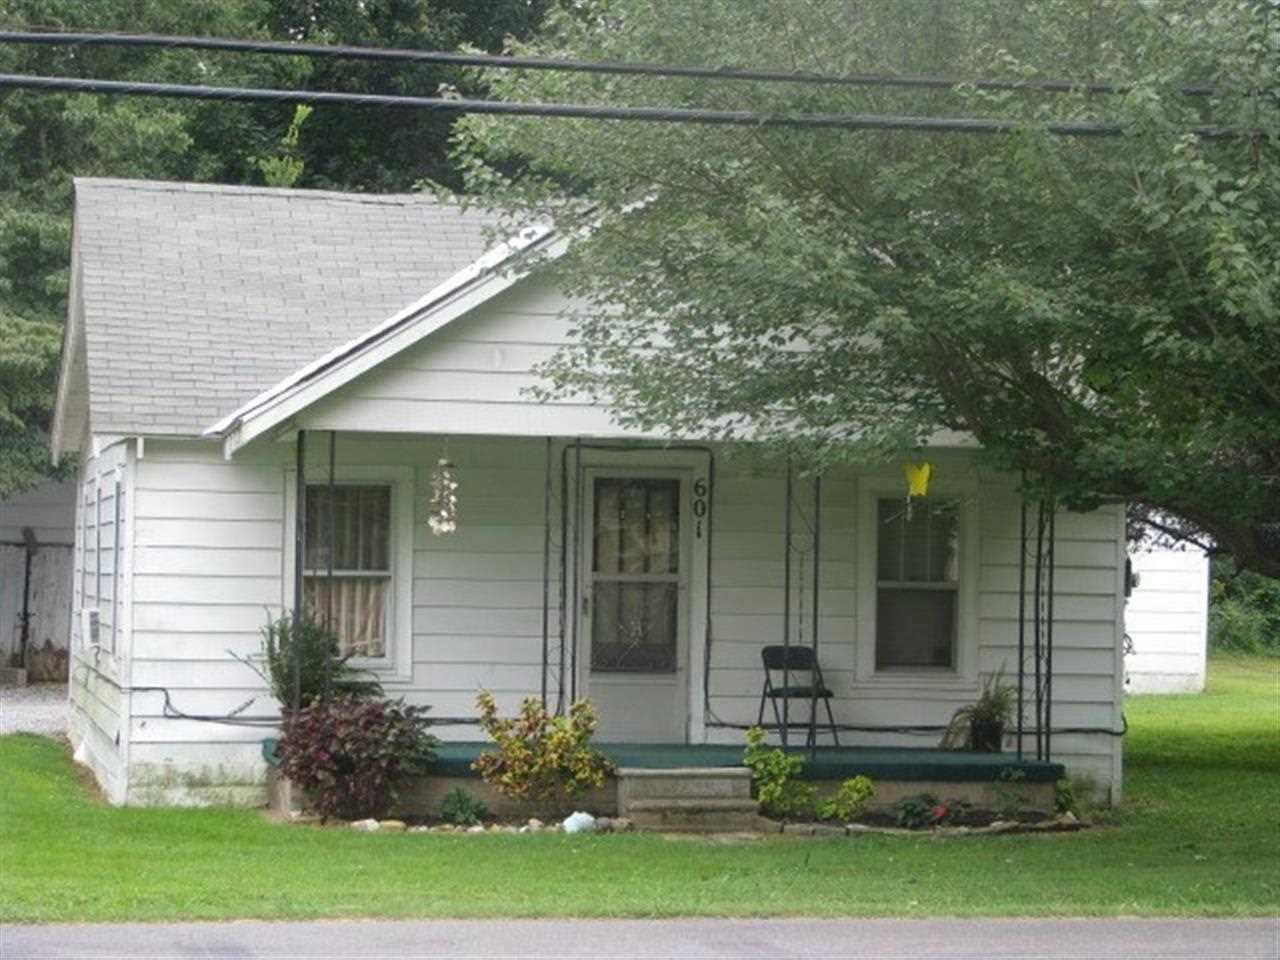 Rental Homes for Rent, ListingId:30294843, location: 601 W 8th St. Benton 42025